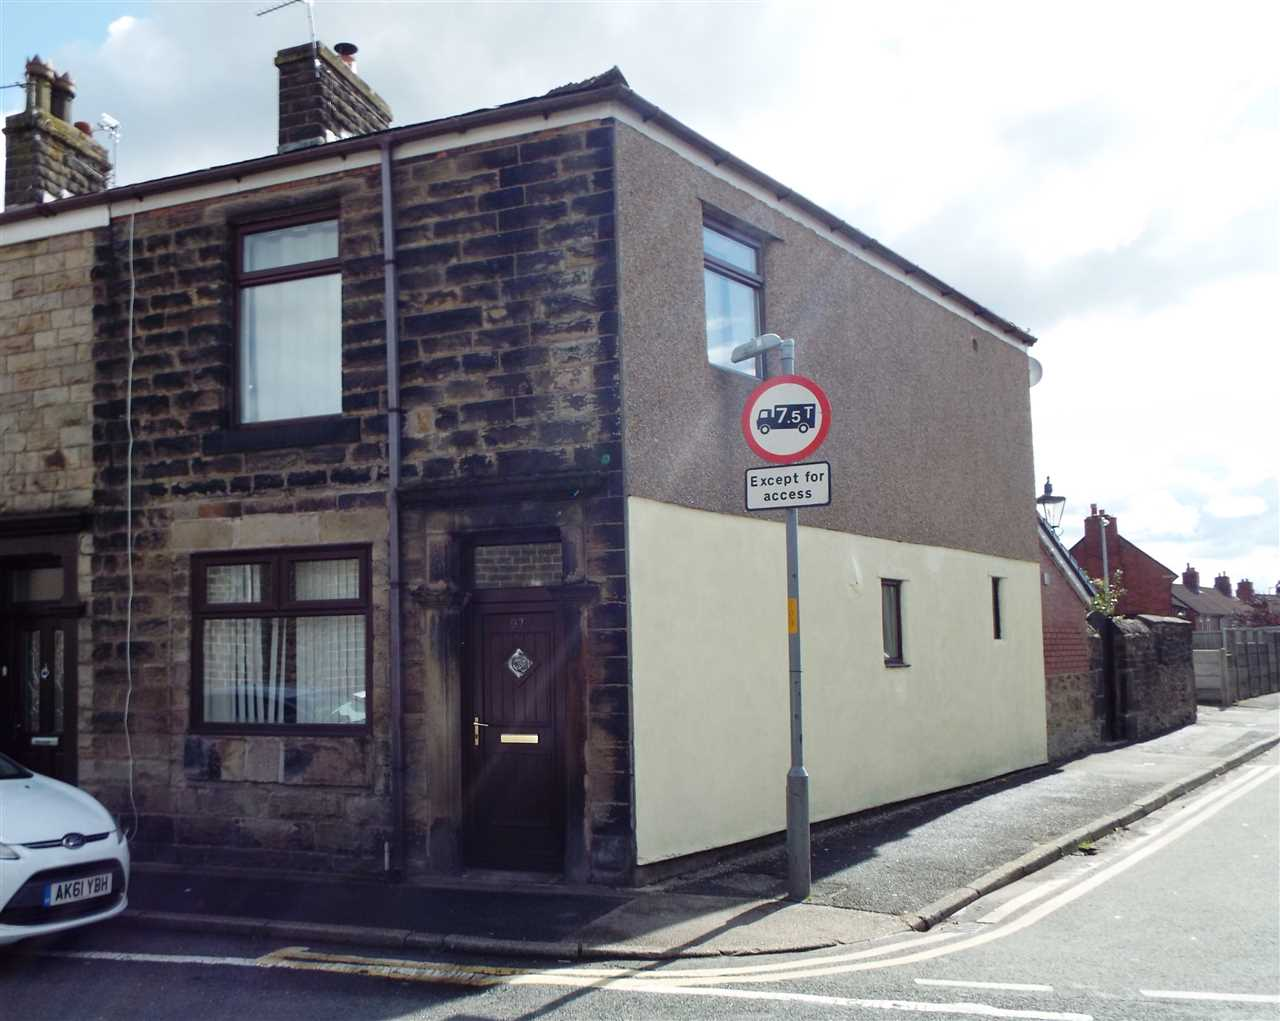 3 bed end of terrace for sale in Park Road, Adlington, Adlington 1